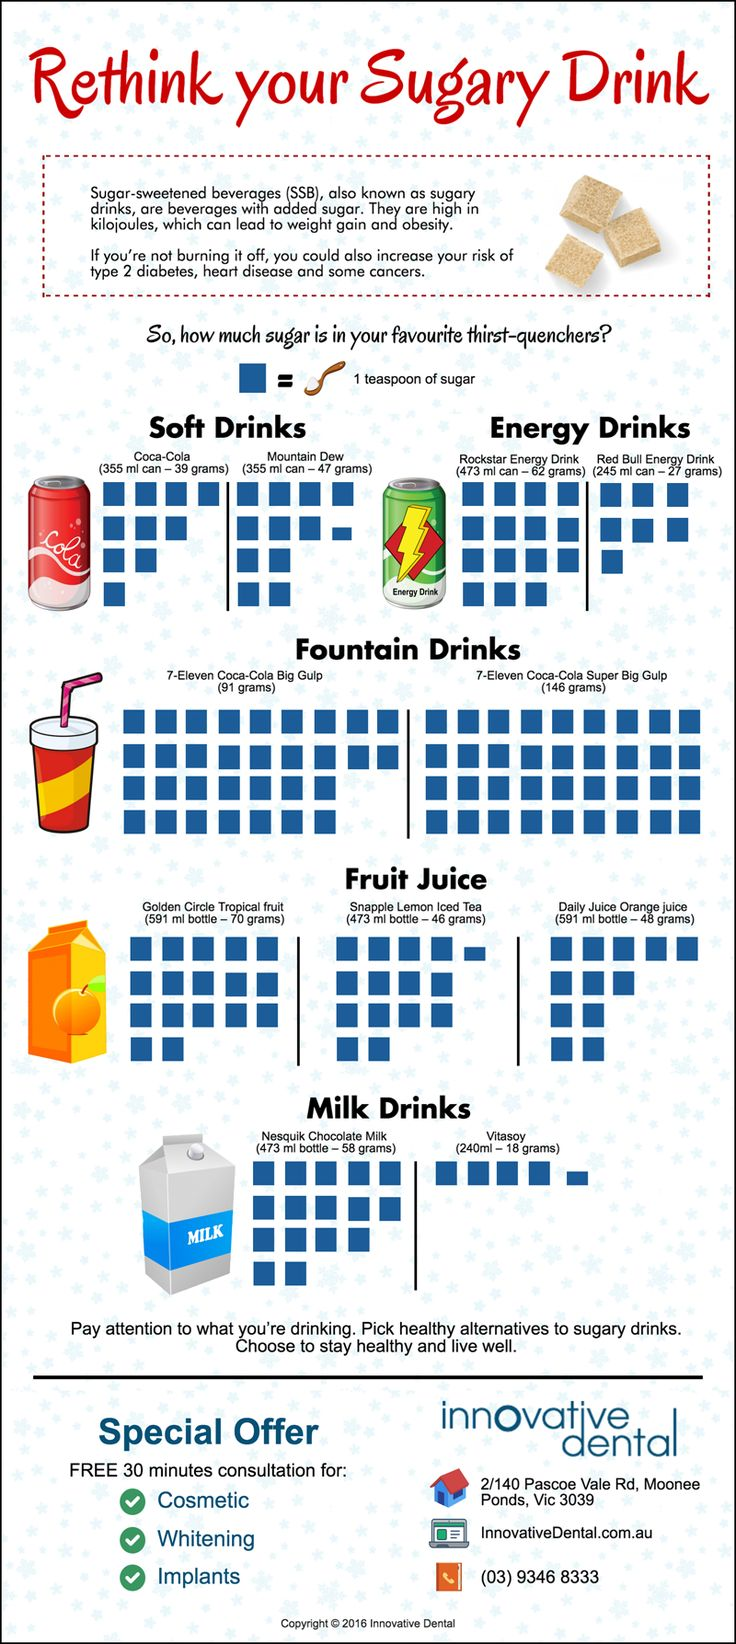 Moonee Ponds Dentist Tips: Rethink your Sugary Drink innovativedental.com.au